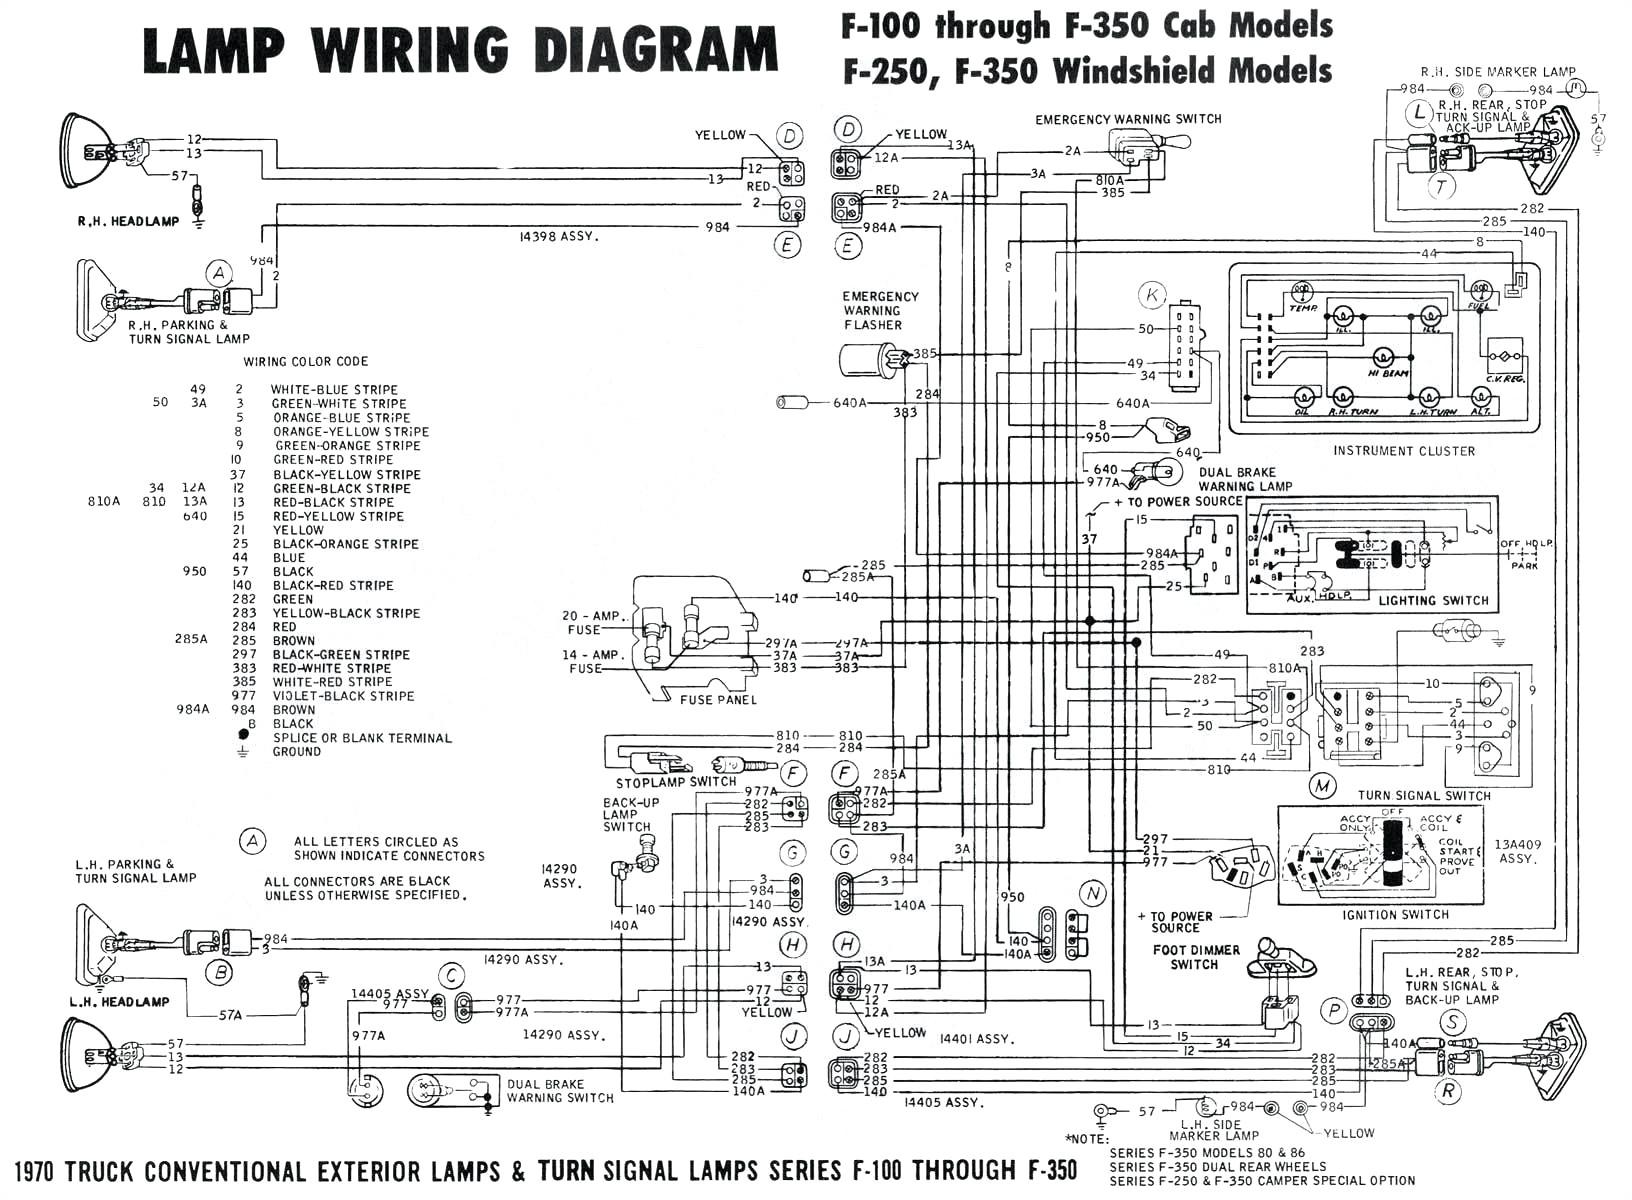 h22a4 wiring harness diagram lovely 82 corvette engine wiring harness diagram library wiring diagrams